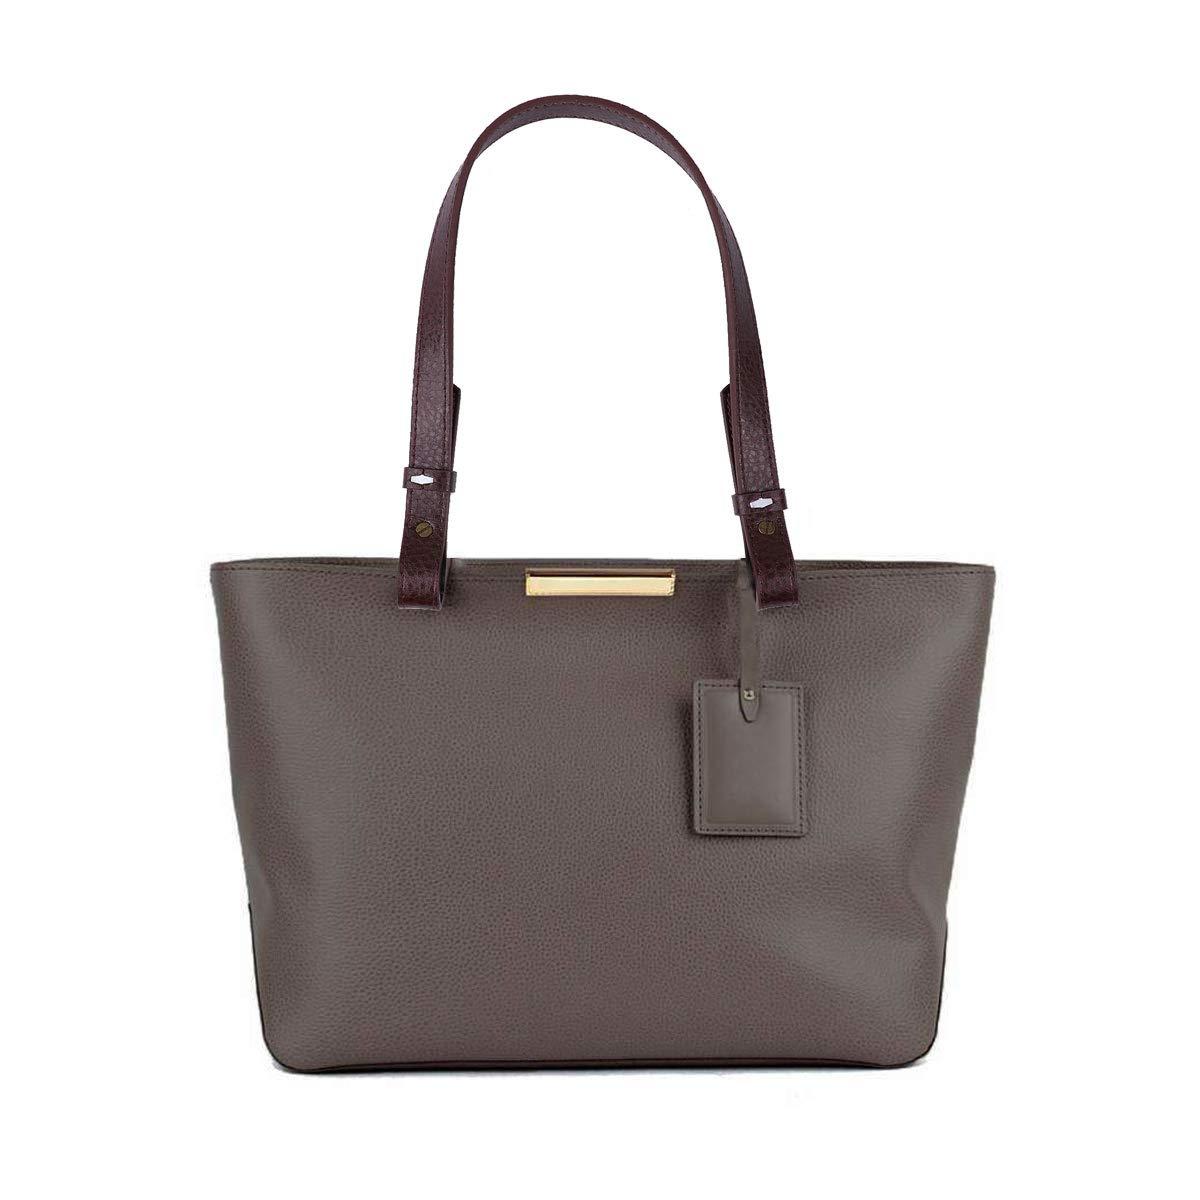 HinLot Pack of 2 Adjustable Shoulder Bag Strap Classic PU Leather Replacement Strap for Handbag Purse Black